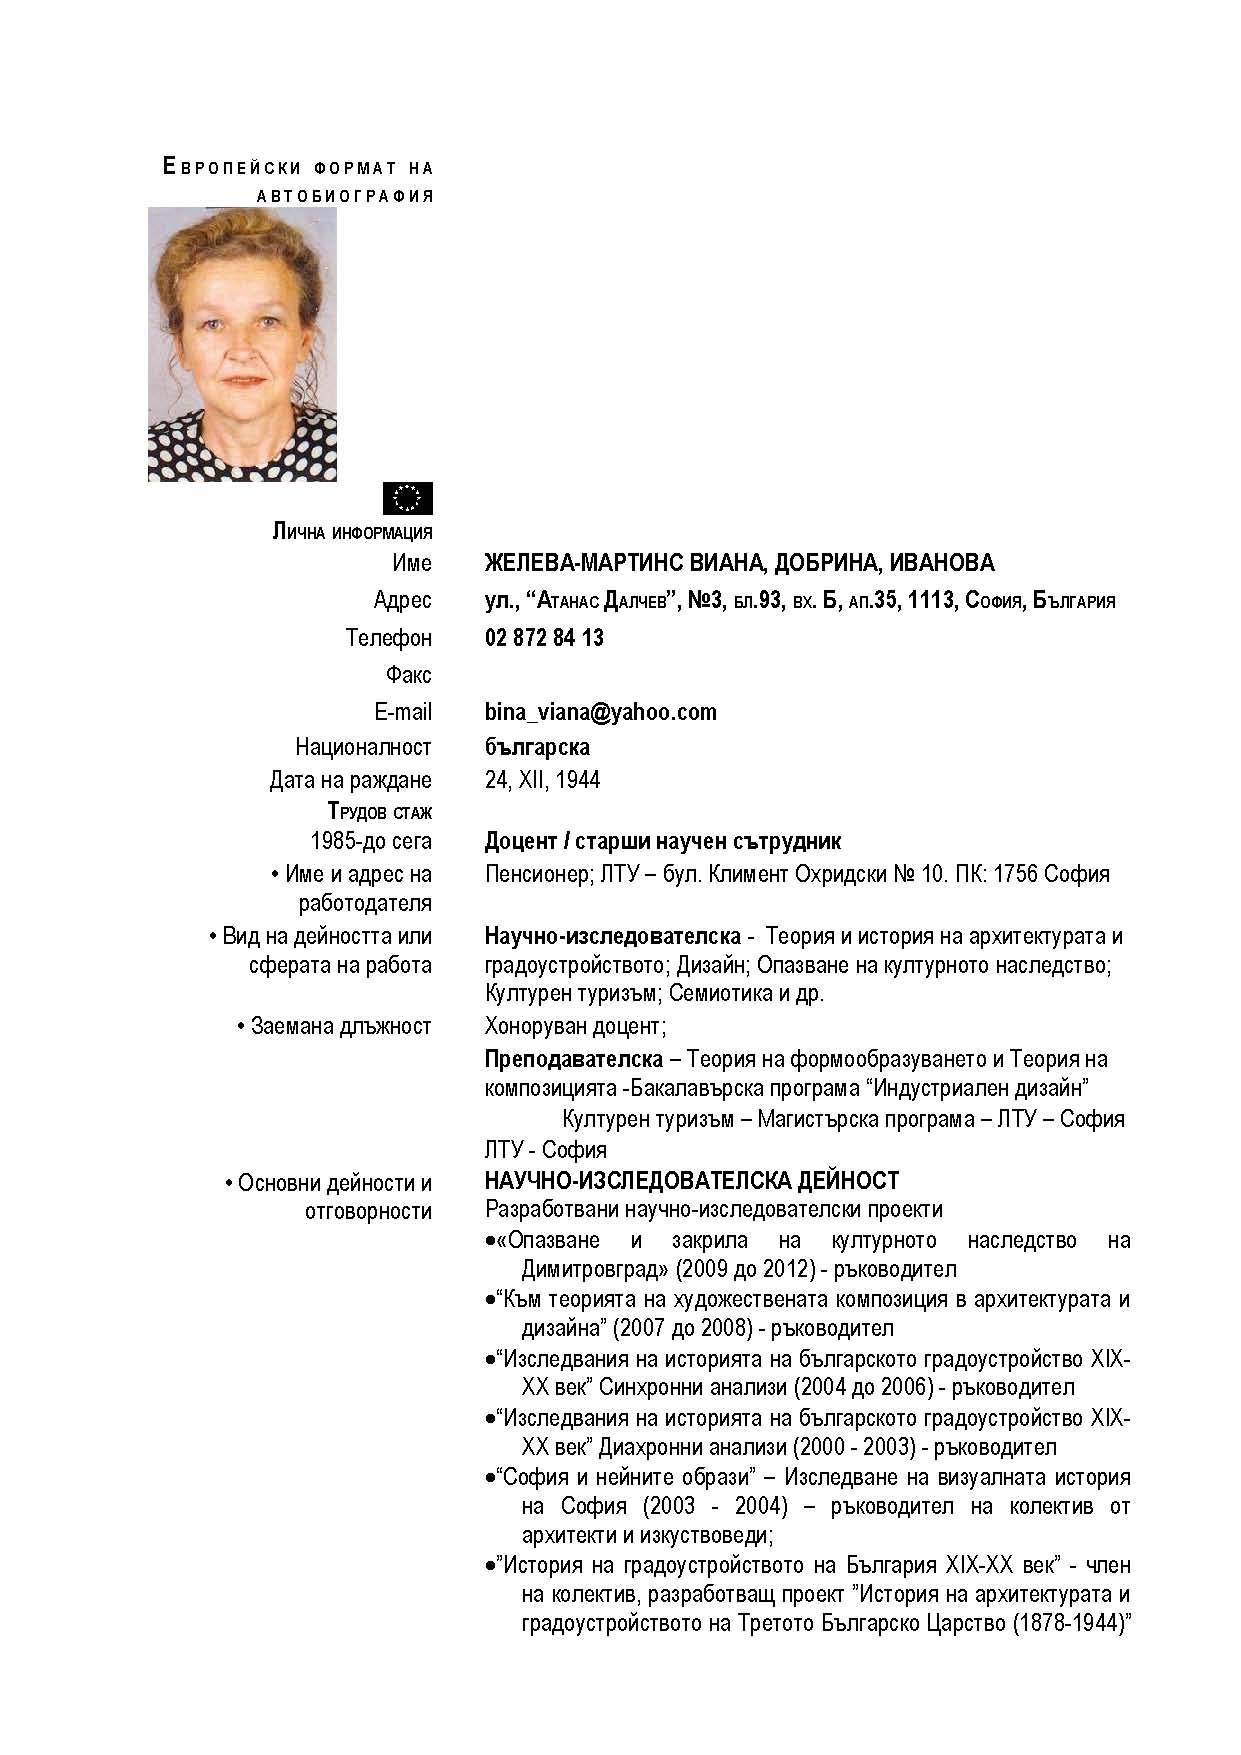 cv or resume format